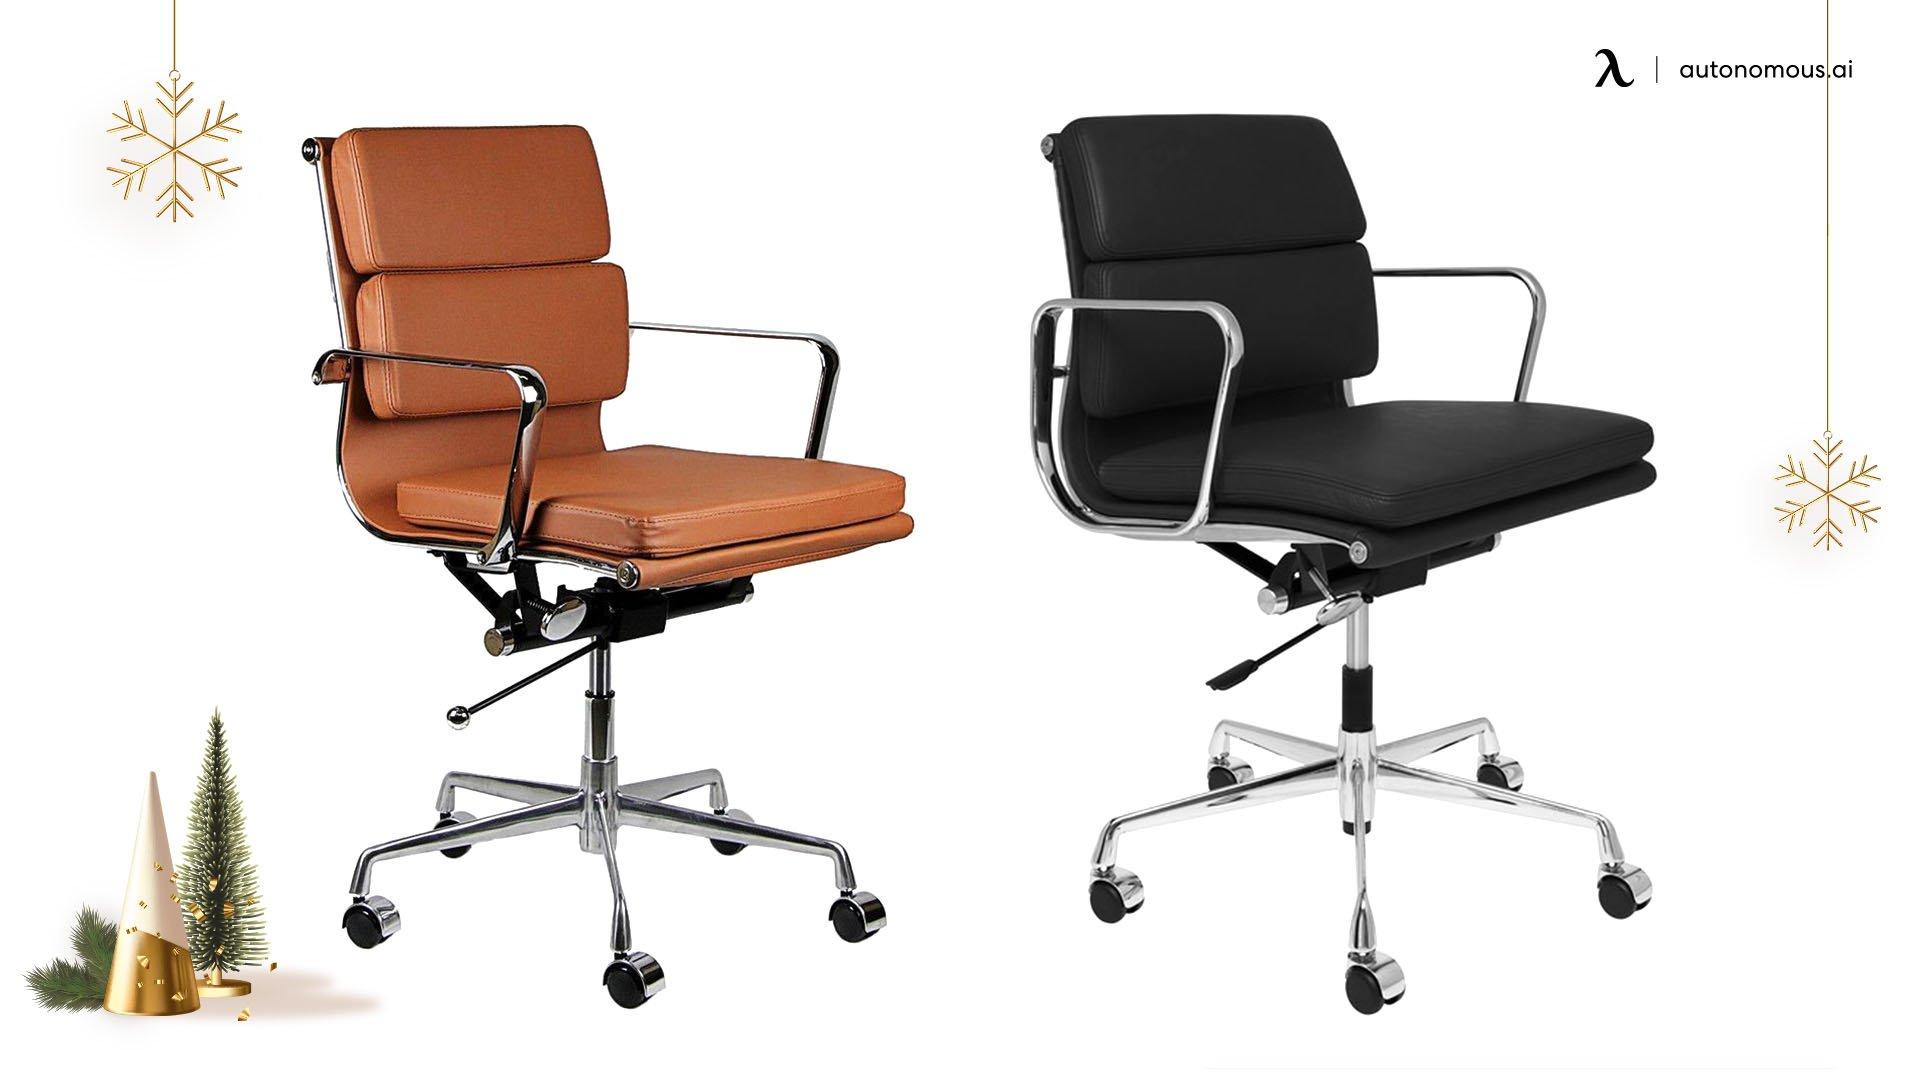 Soft Pad Ergonomic chair